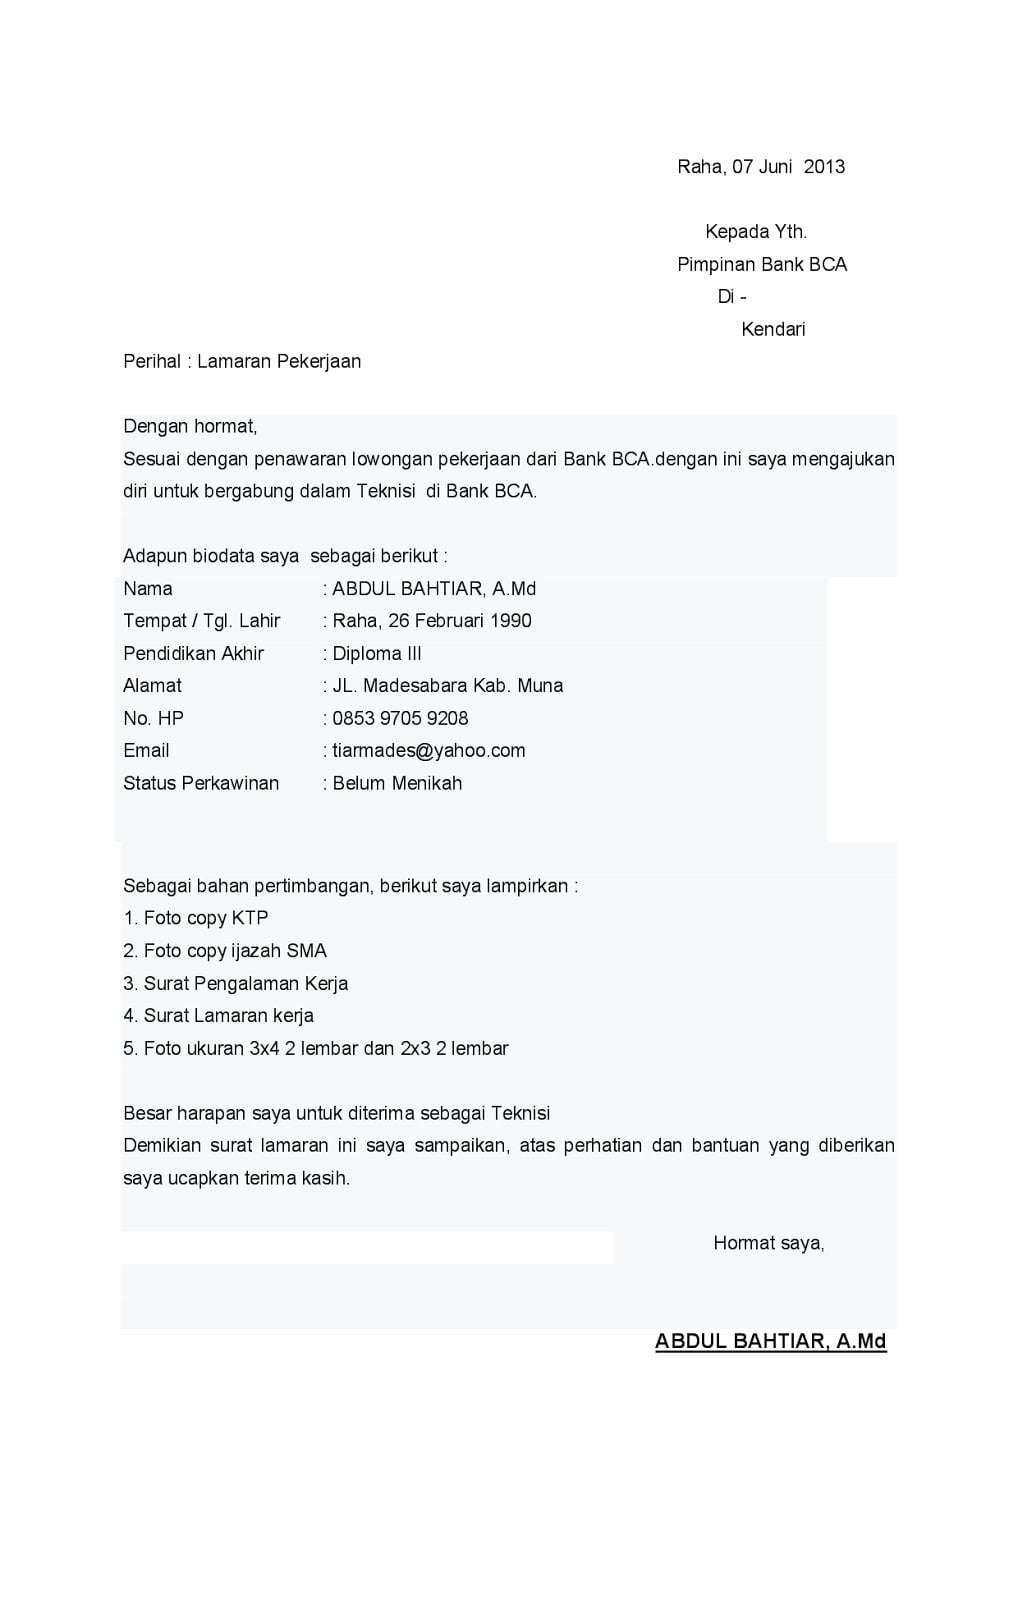 50 Contoh Surat Lamaran Kerja Notaris Surat Pimpinan Inggris